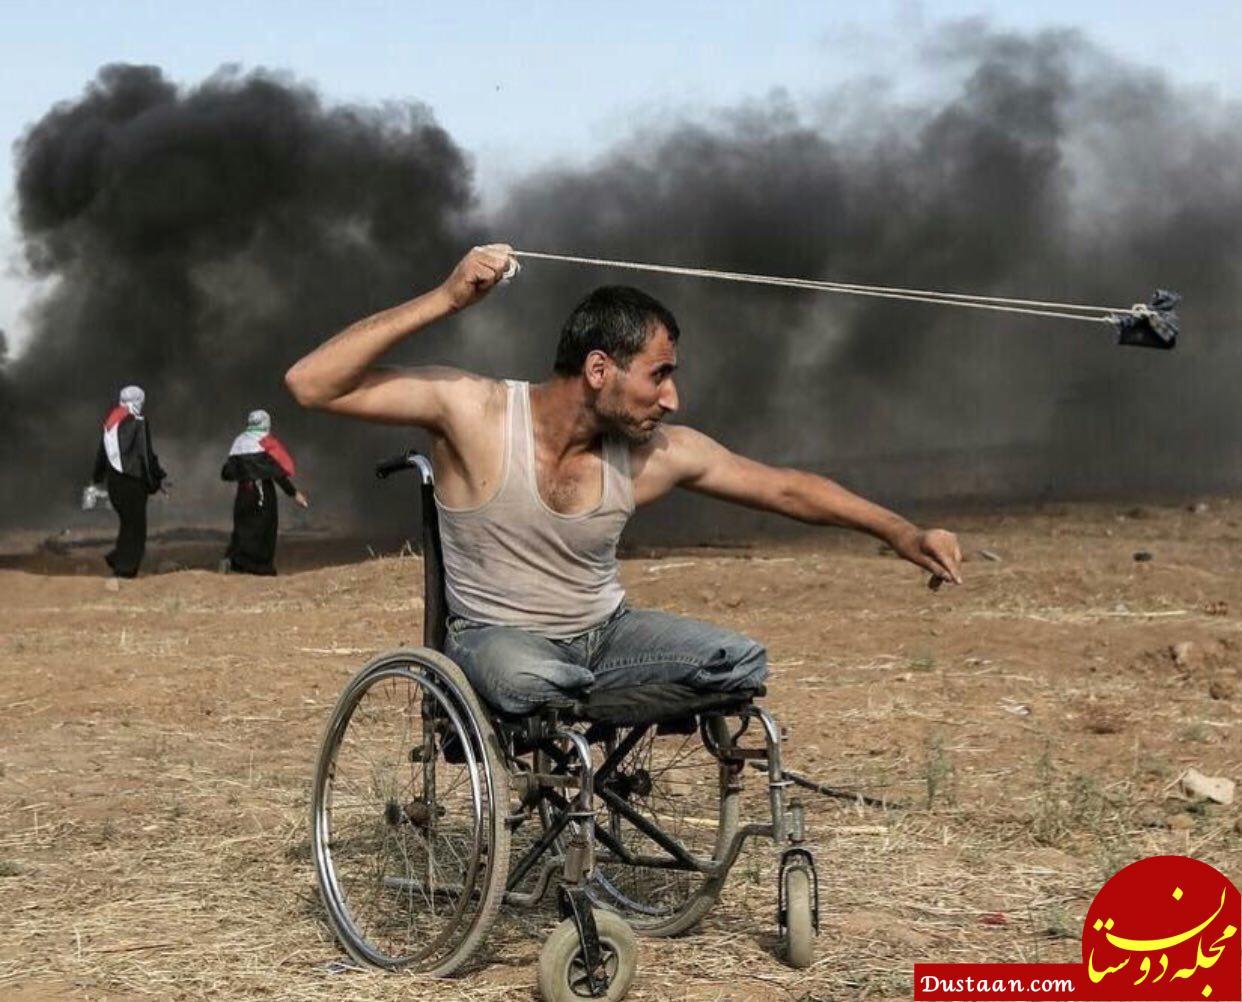 www.dustaan.com جوان 29 ساله فلسطینی که تصویرش دنیا را تکان داد